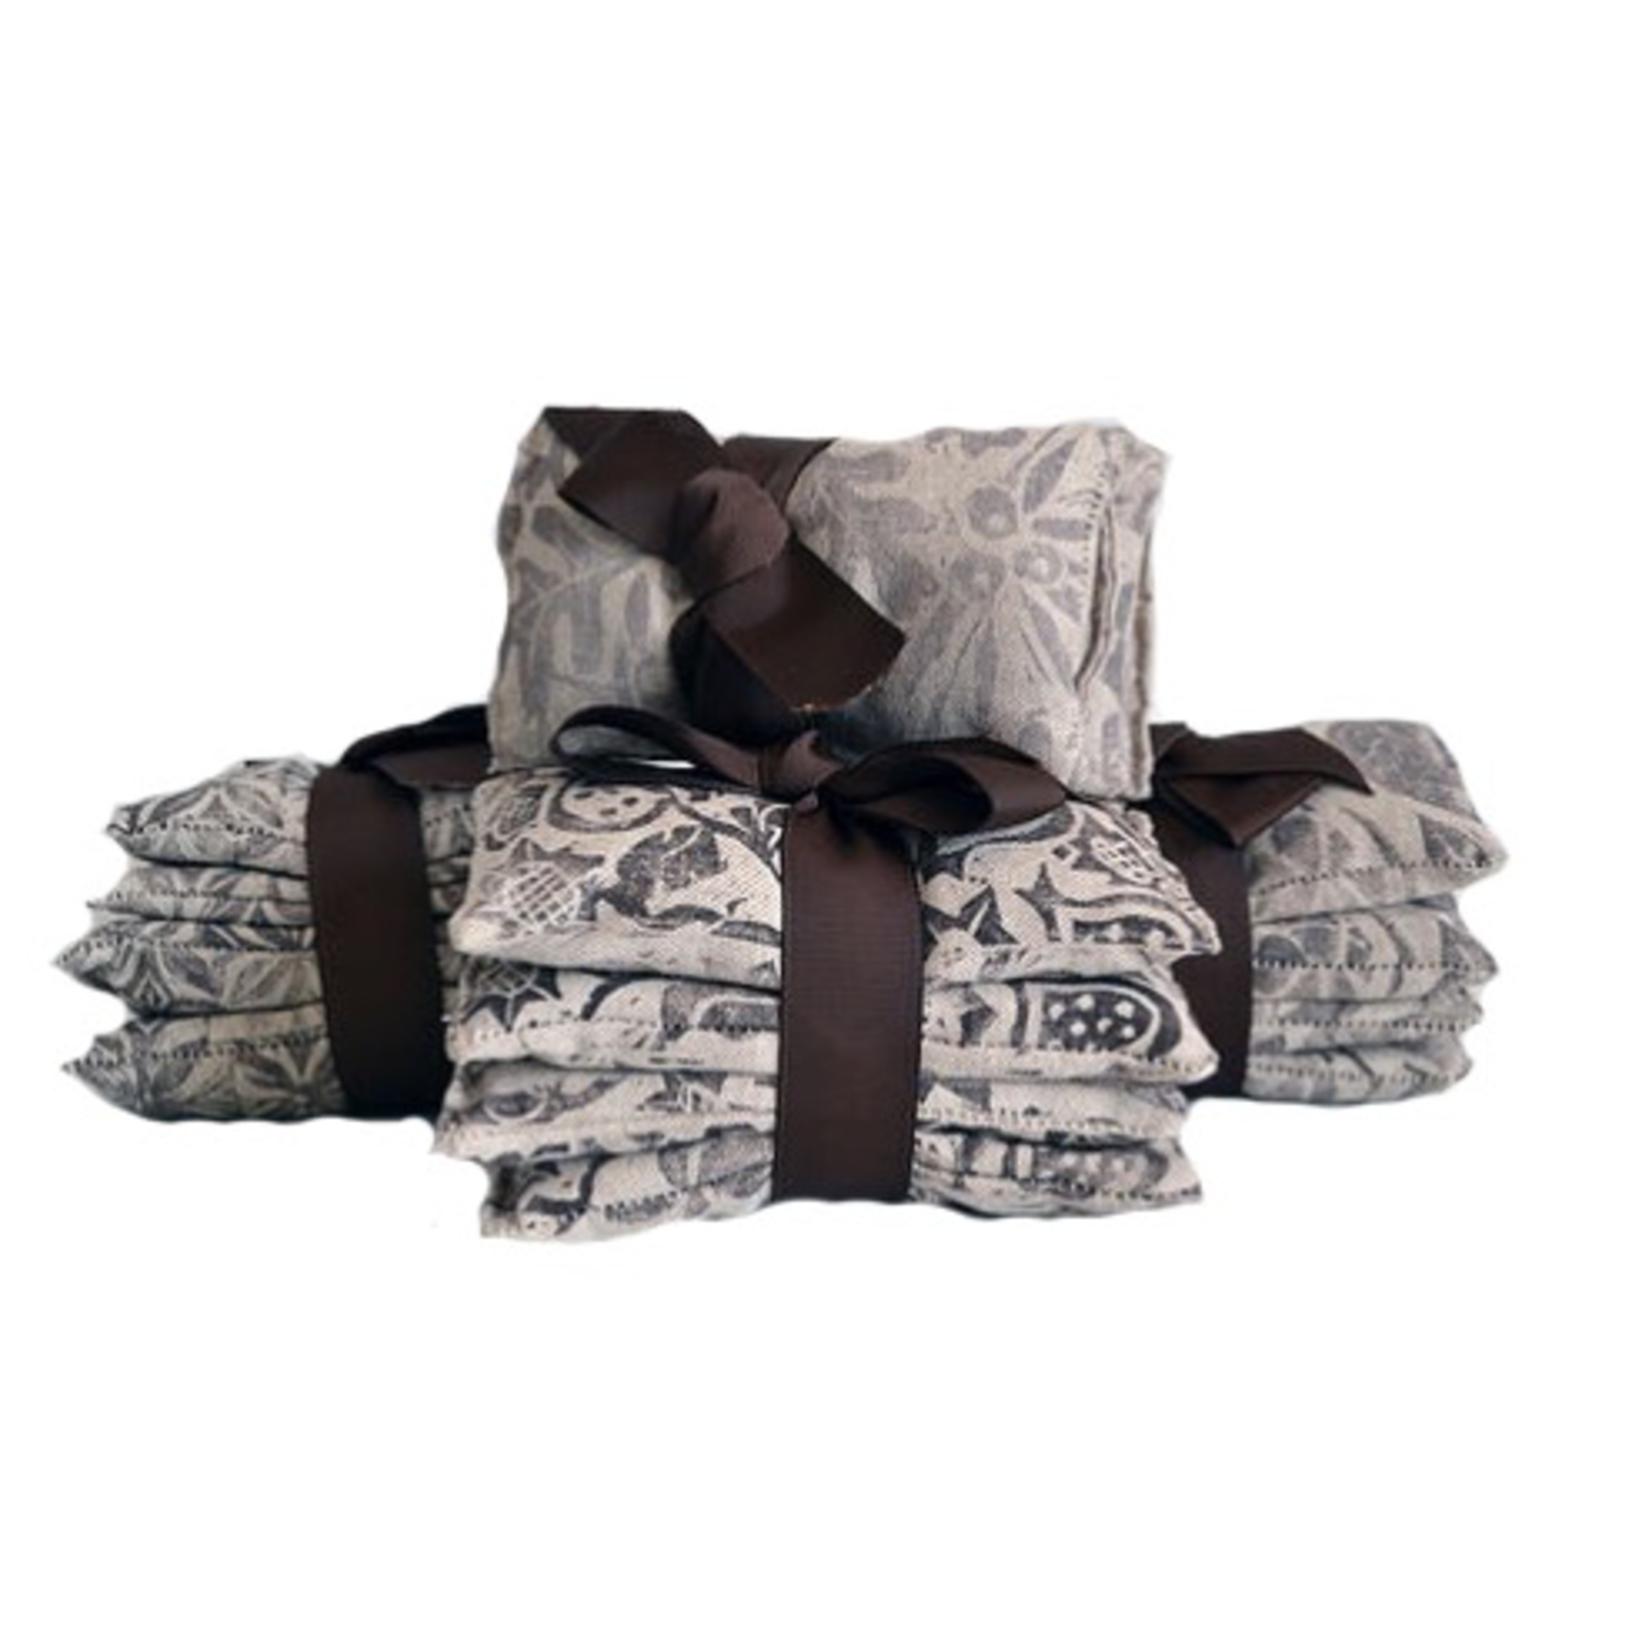 Otvungen 3 x Scented Pillows - Wild Fig